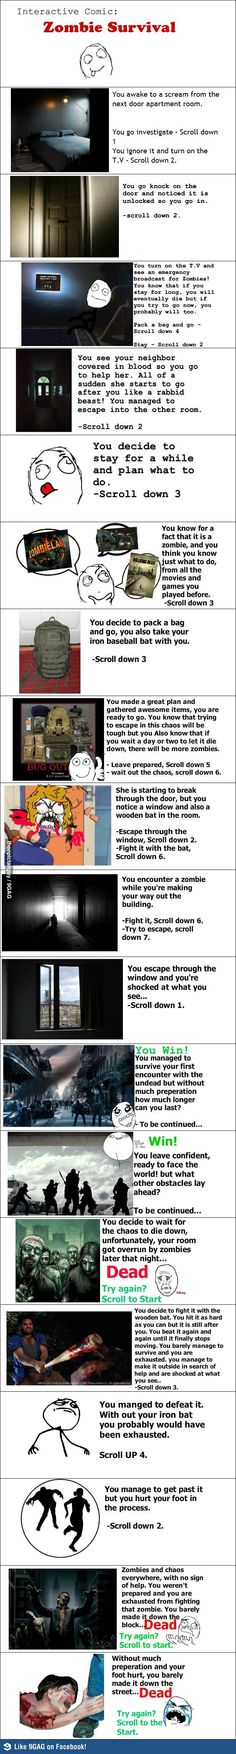 Interactive Zombie Survival Comic